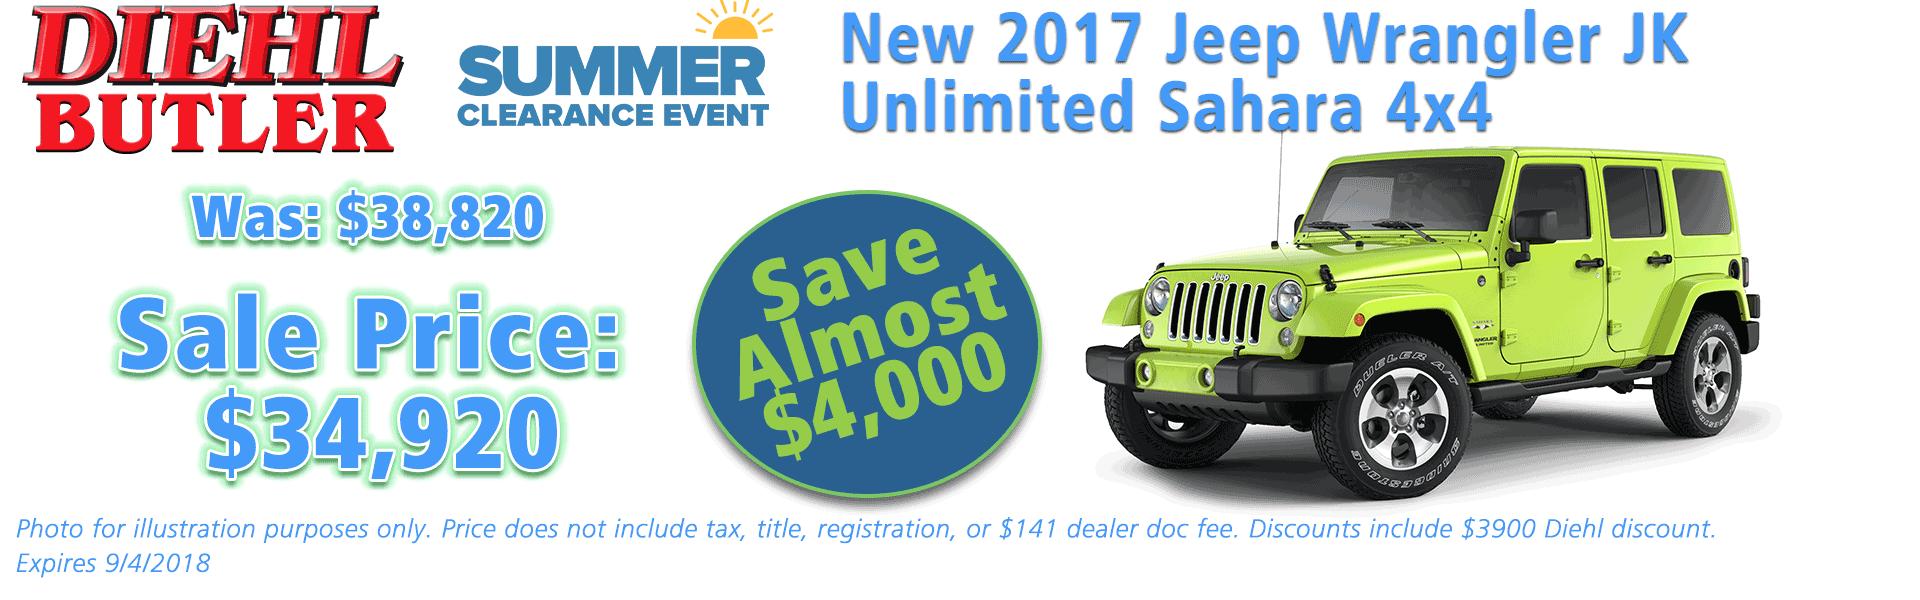 Diehl of Butler, Butler, PA Chrysler Dodge Jeep Ram Toyota Volkswagen service collision sales NEW 2017 JEEP WRANGLER UNLIMITED SAHARA 4X4